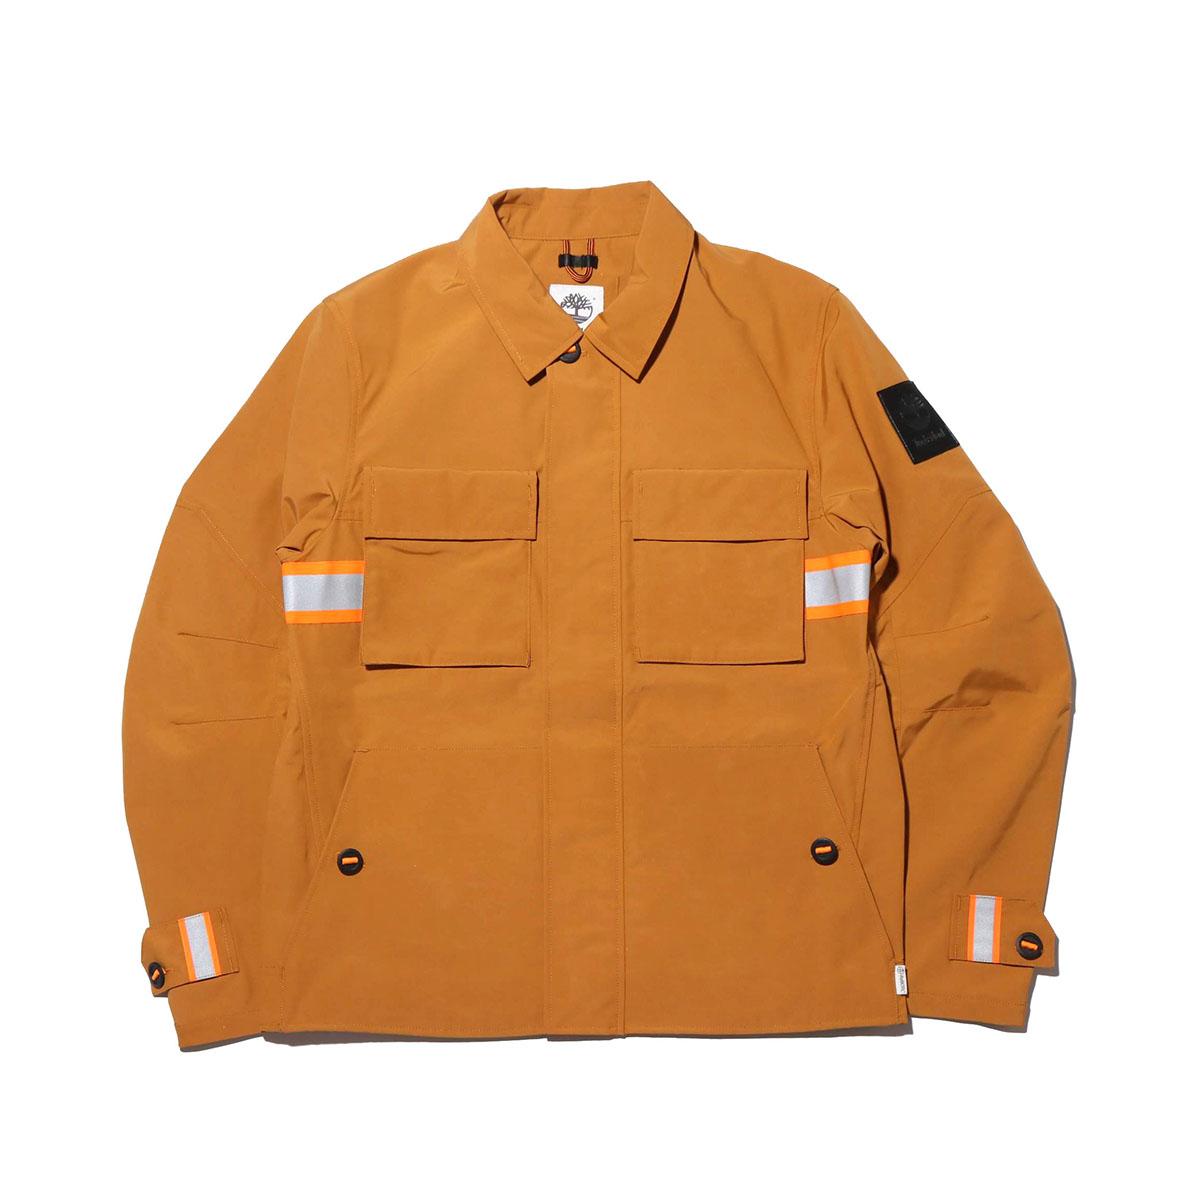 Timberland AF Worker Jacket(ティバンーランド AF ワーカージャケット)Wheat【メンズ ジャケット】20SS-S